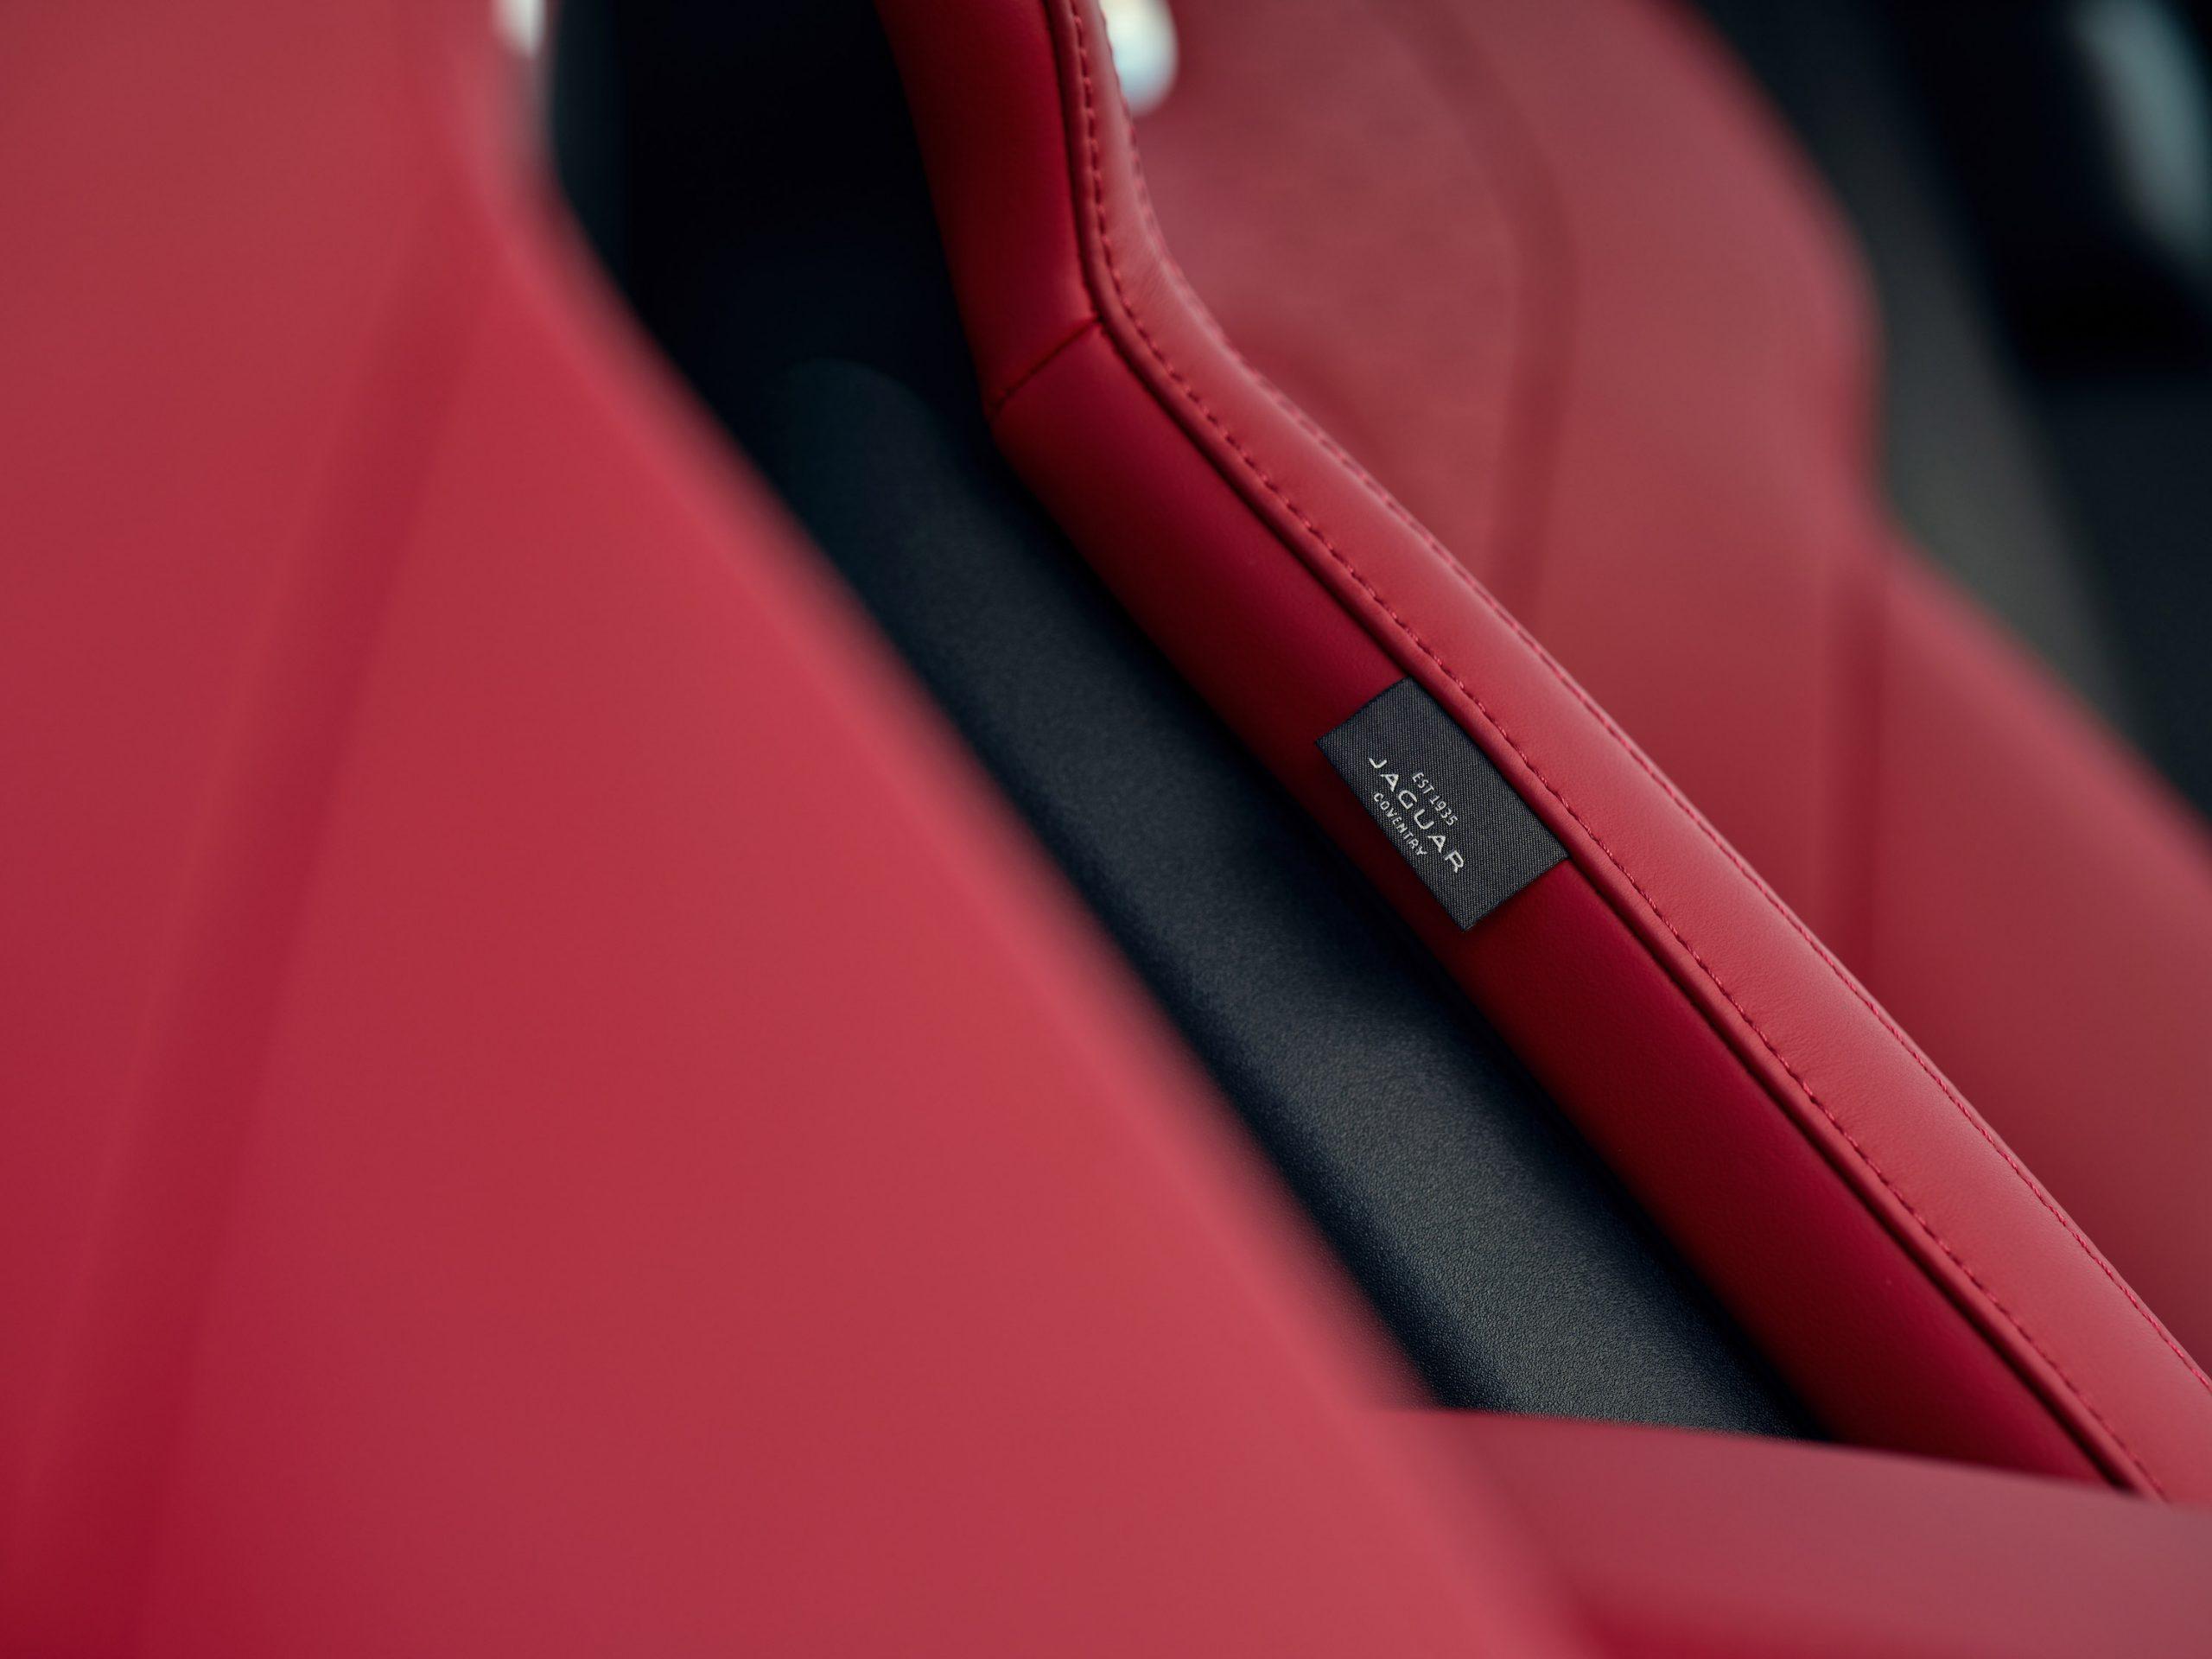 2021 Jaguar F-PACE interior seat leather detail